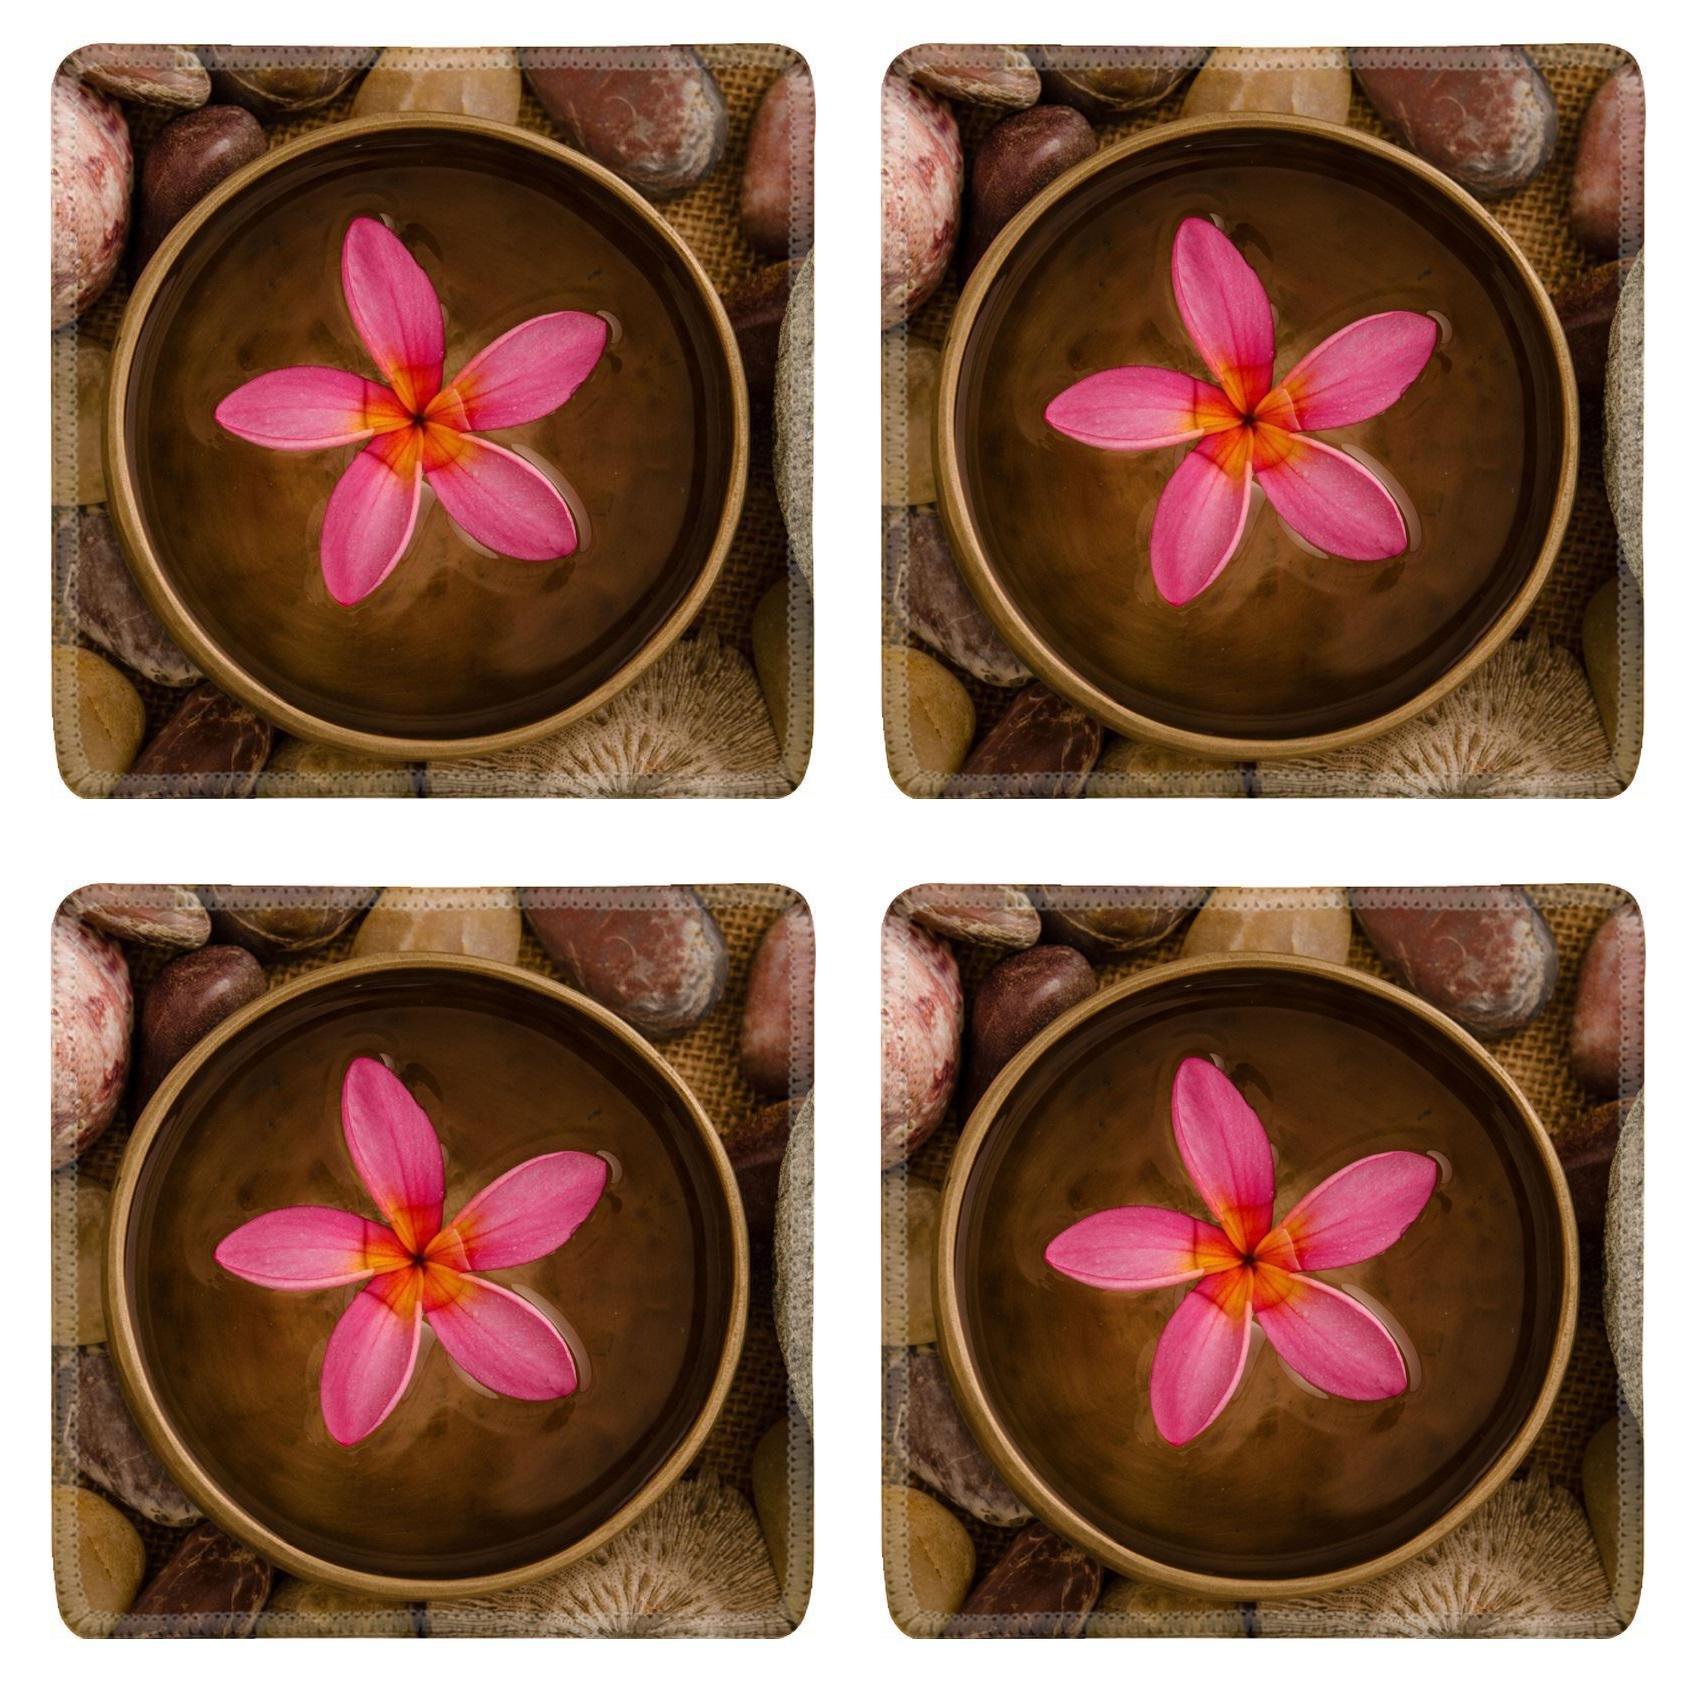 MSD Square Coasters Non-Slip Natural Rubber Desk Coasters design 20619993 frangipani spa concept photo lowlight ambient spa shallow dof by MSD (Image #1)